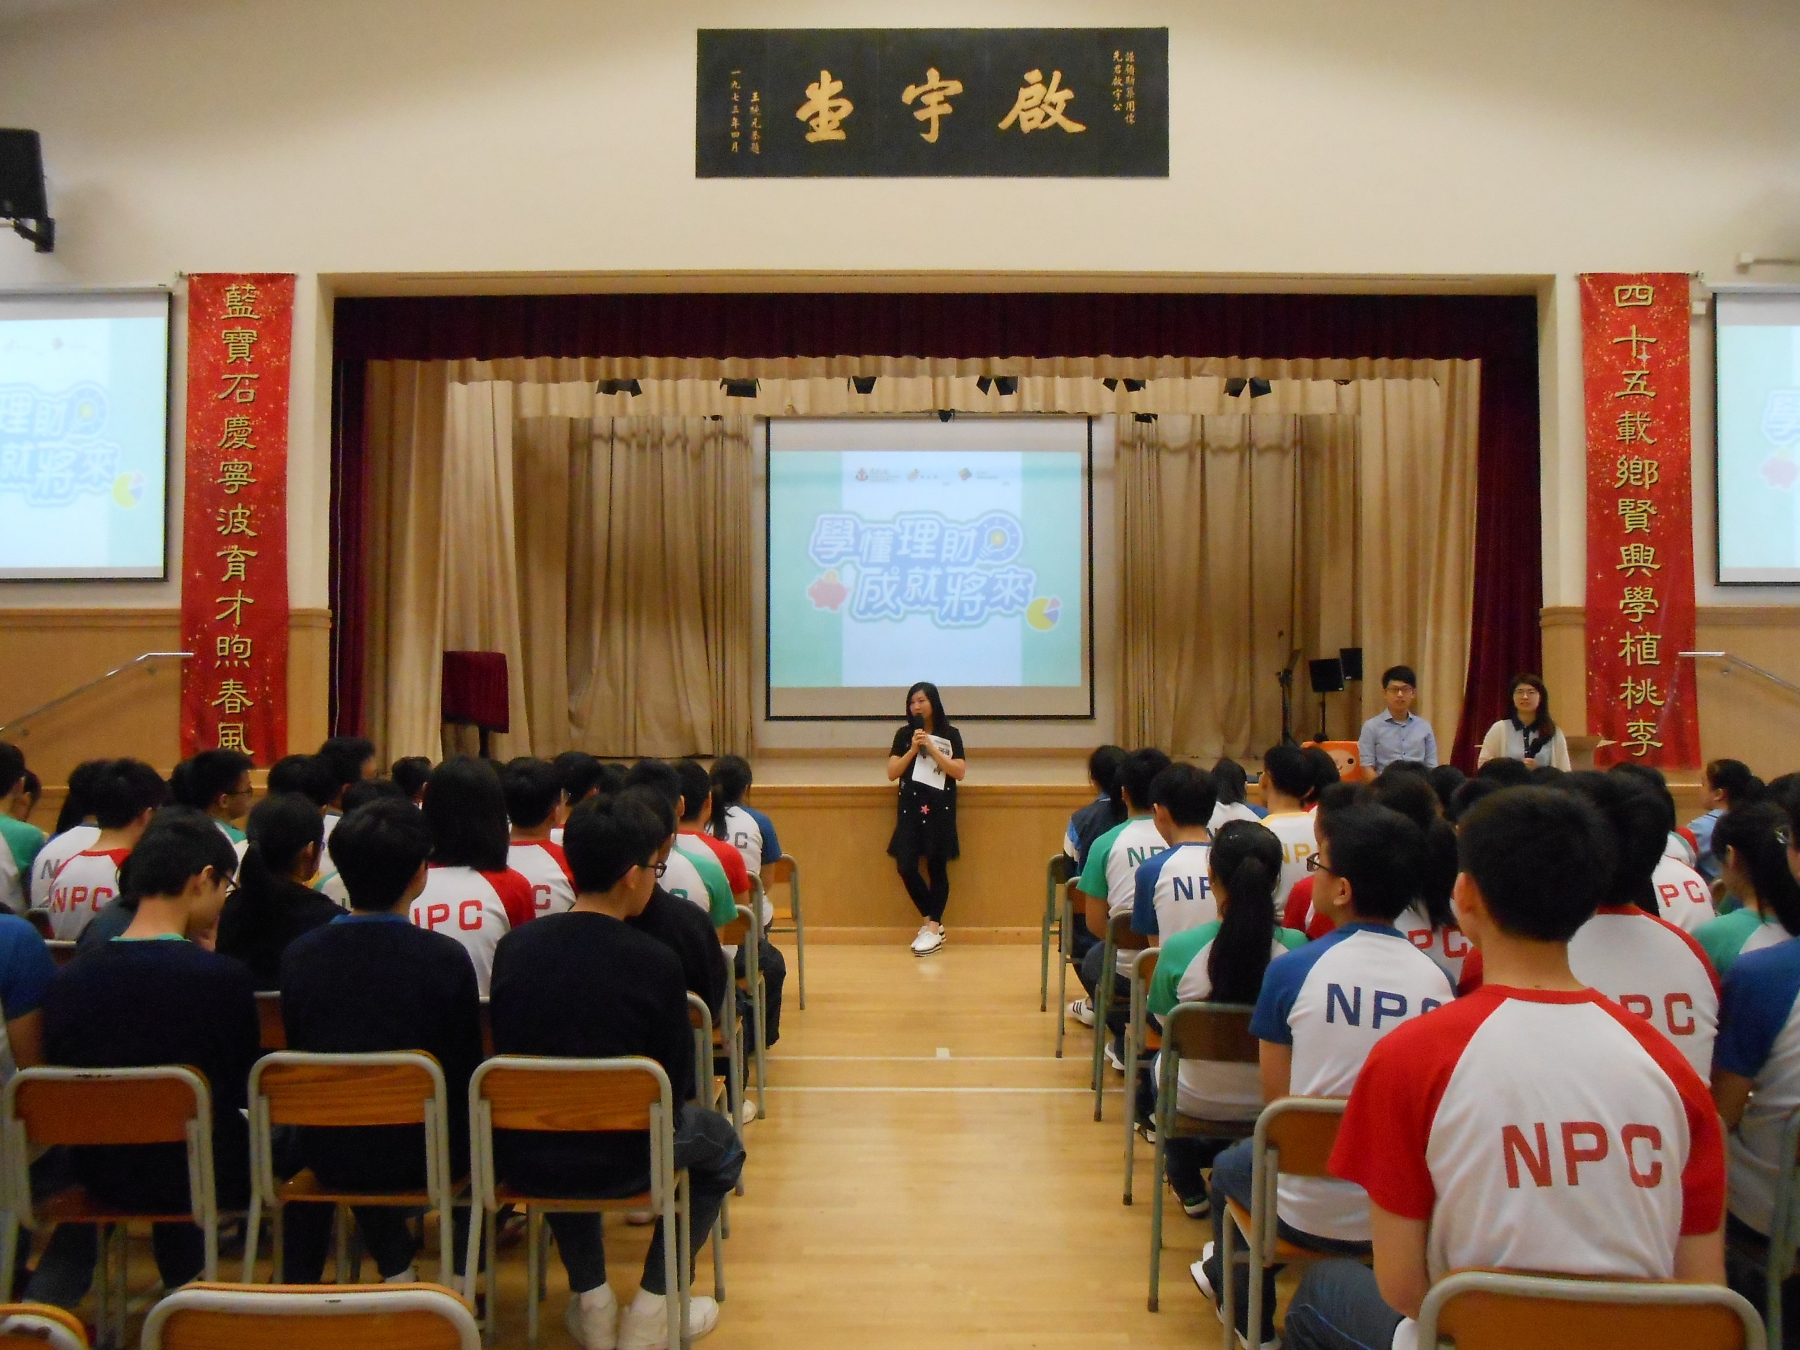 http://npc.edu.hk/sites/default/files/dscn1975.jpg